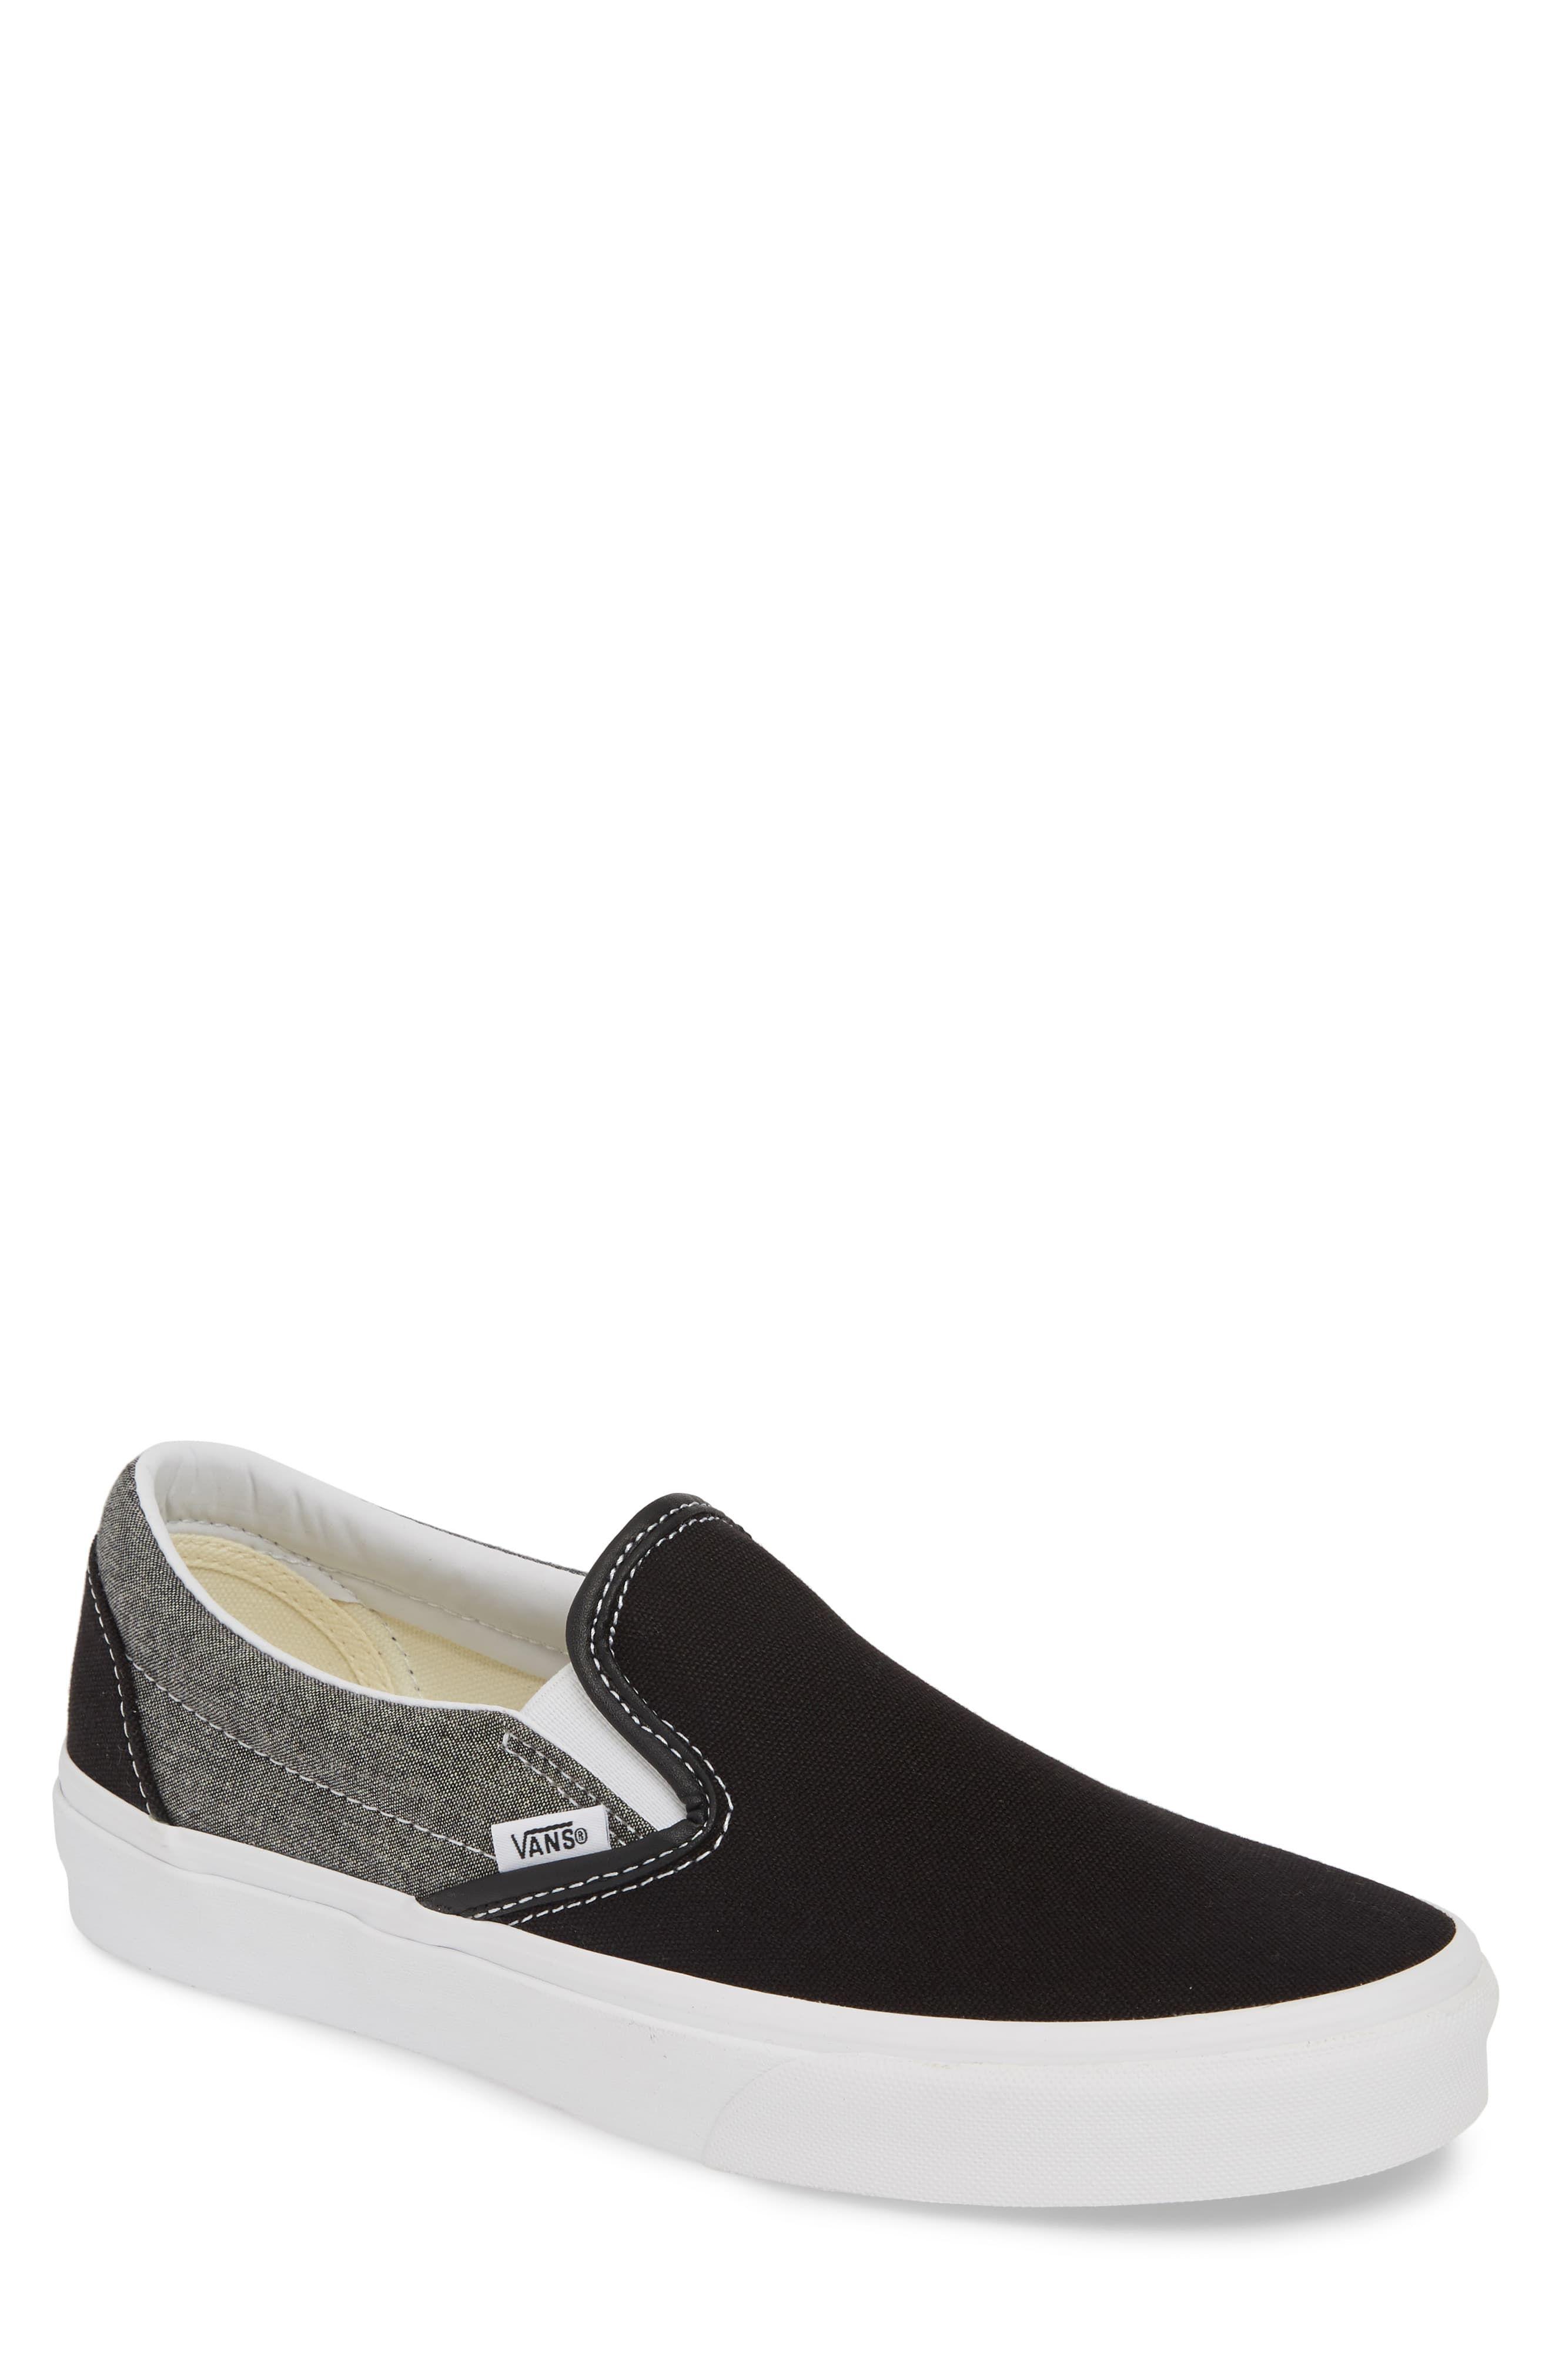 Vans 'Classic' Slip On Sneaker (Men | Sneakers, Slip on, Vans